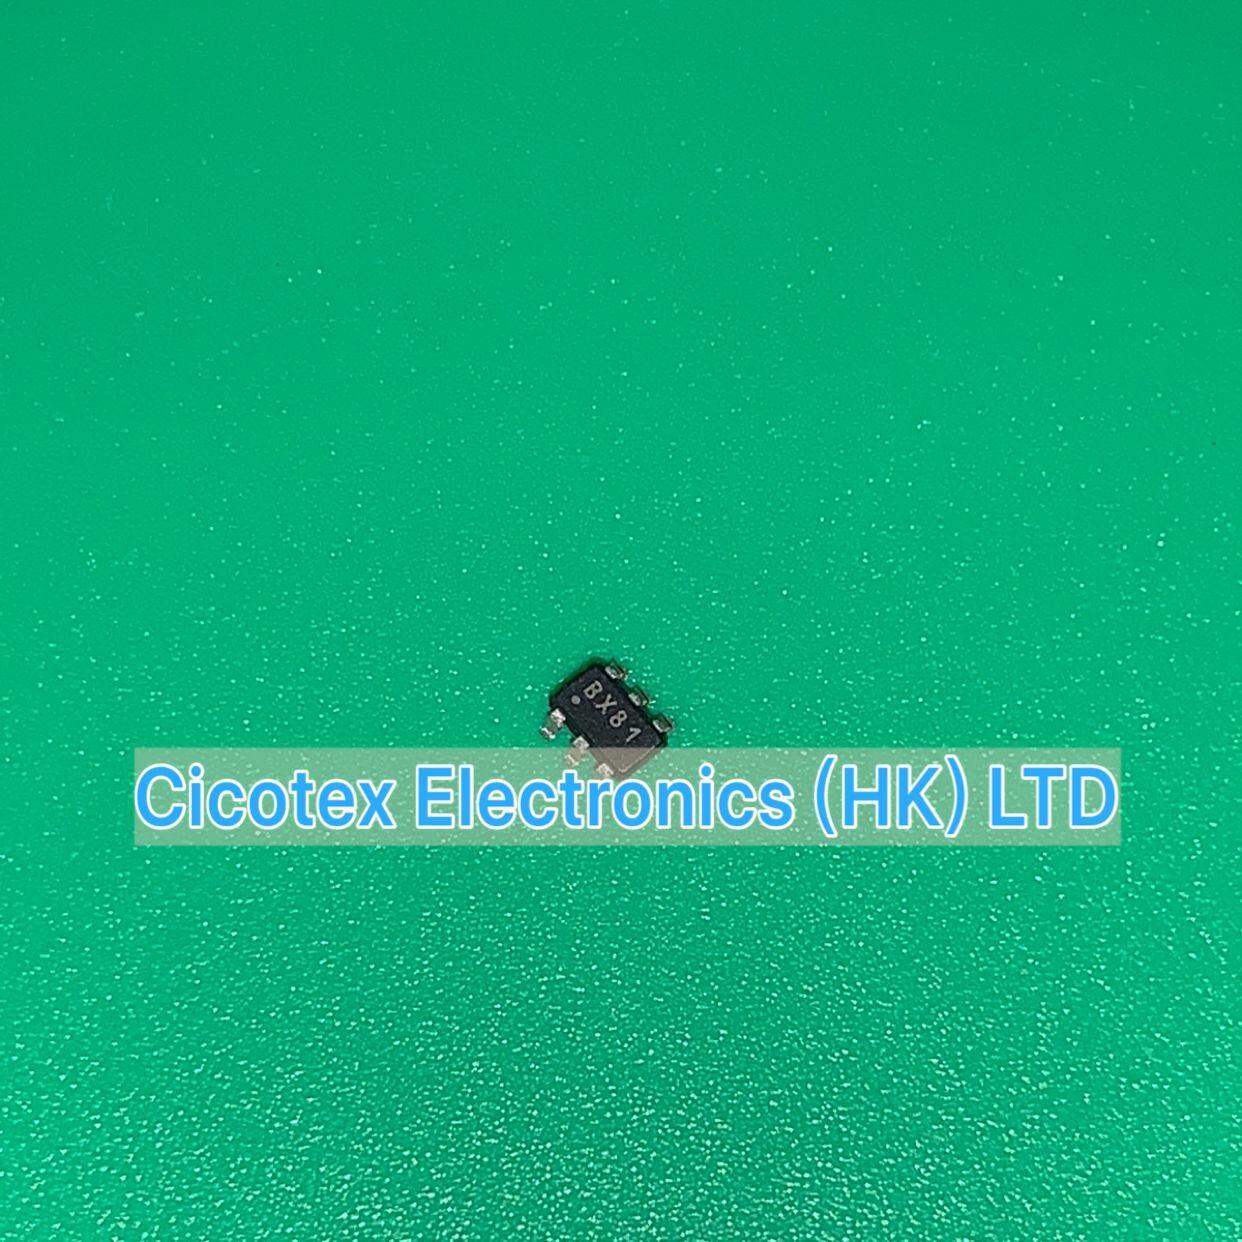 5pcs/lot MCP1640CT-I/CHY SOT-23 BX81 MCP 1640 CT-I/CHY BX6L BXQD BX MCP1640CT-ICHY IC REG BOOST ADJ 350MA SOT23-6 MCP1640CTICHY